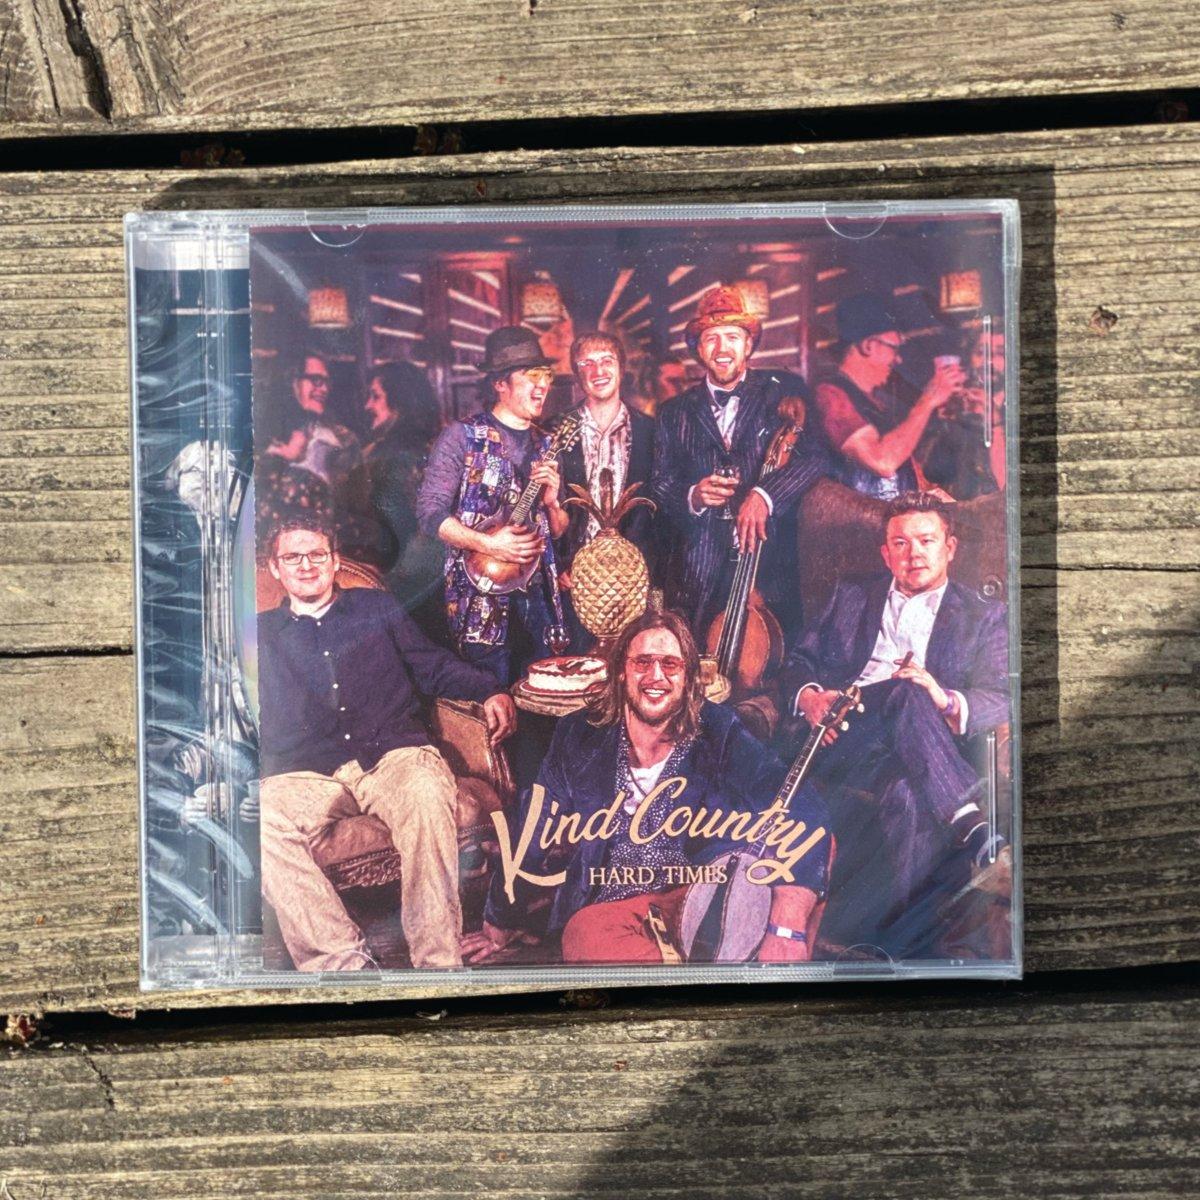 HARD TIMES CD